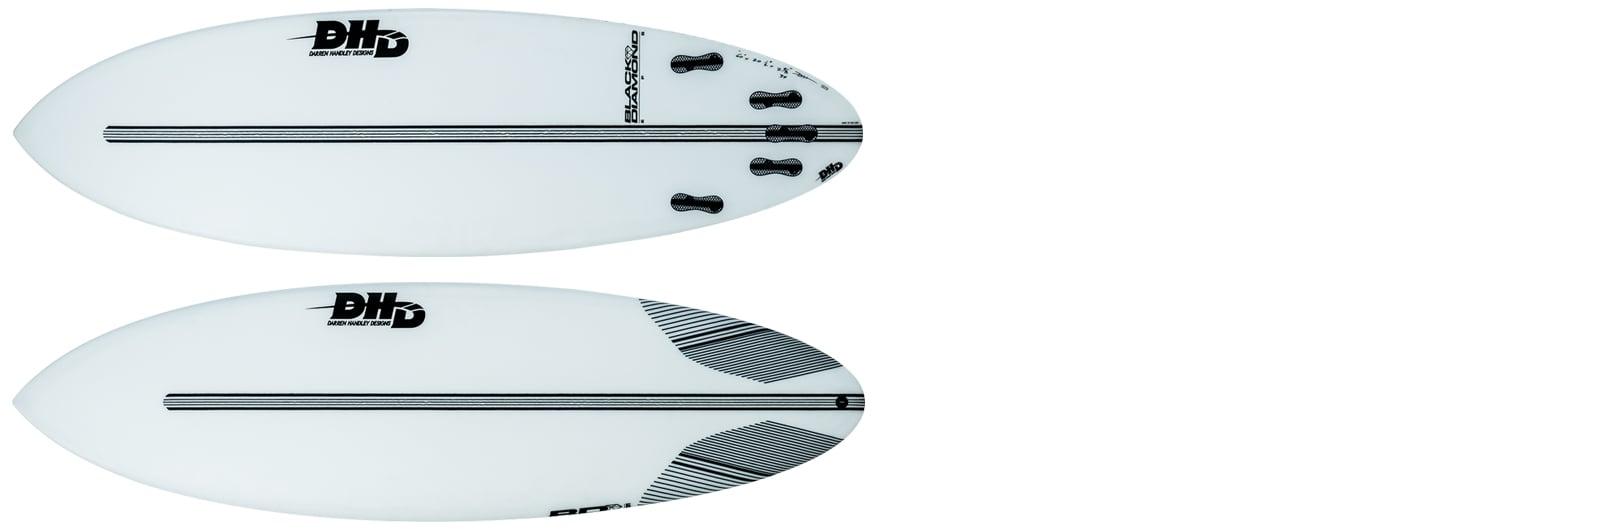 Black Diamond EPS Boardcave DHD Surfboards